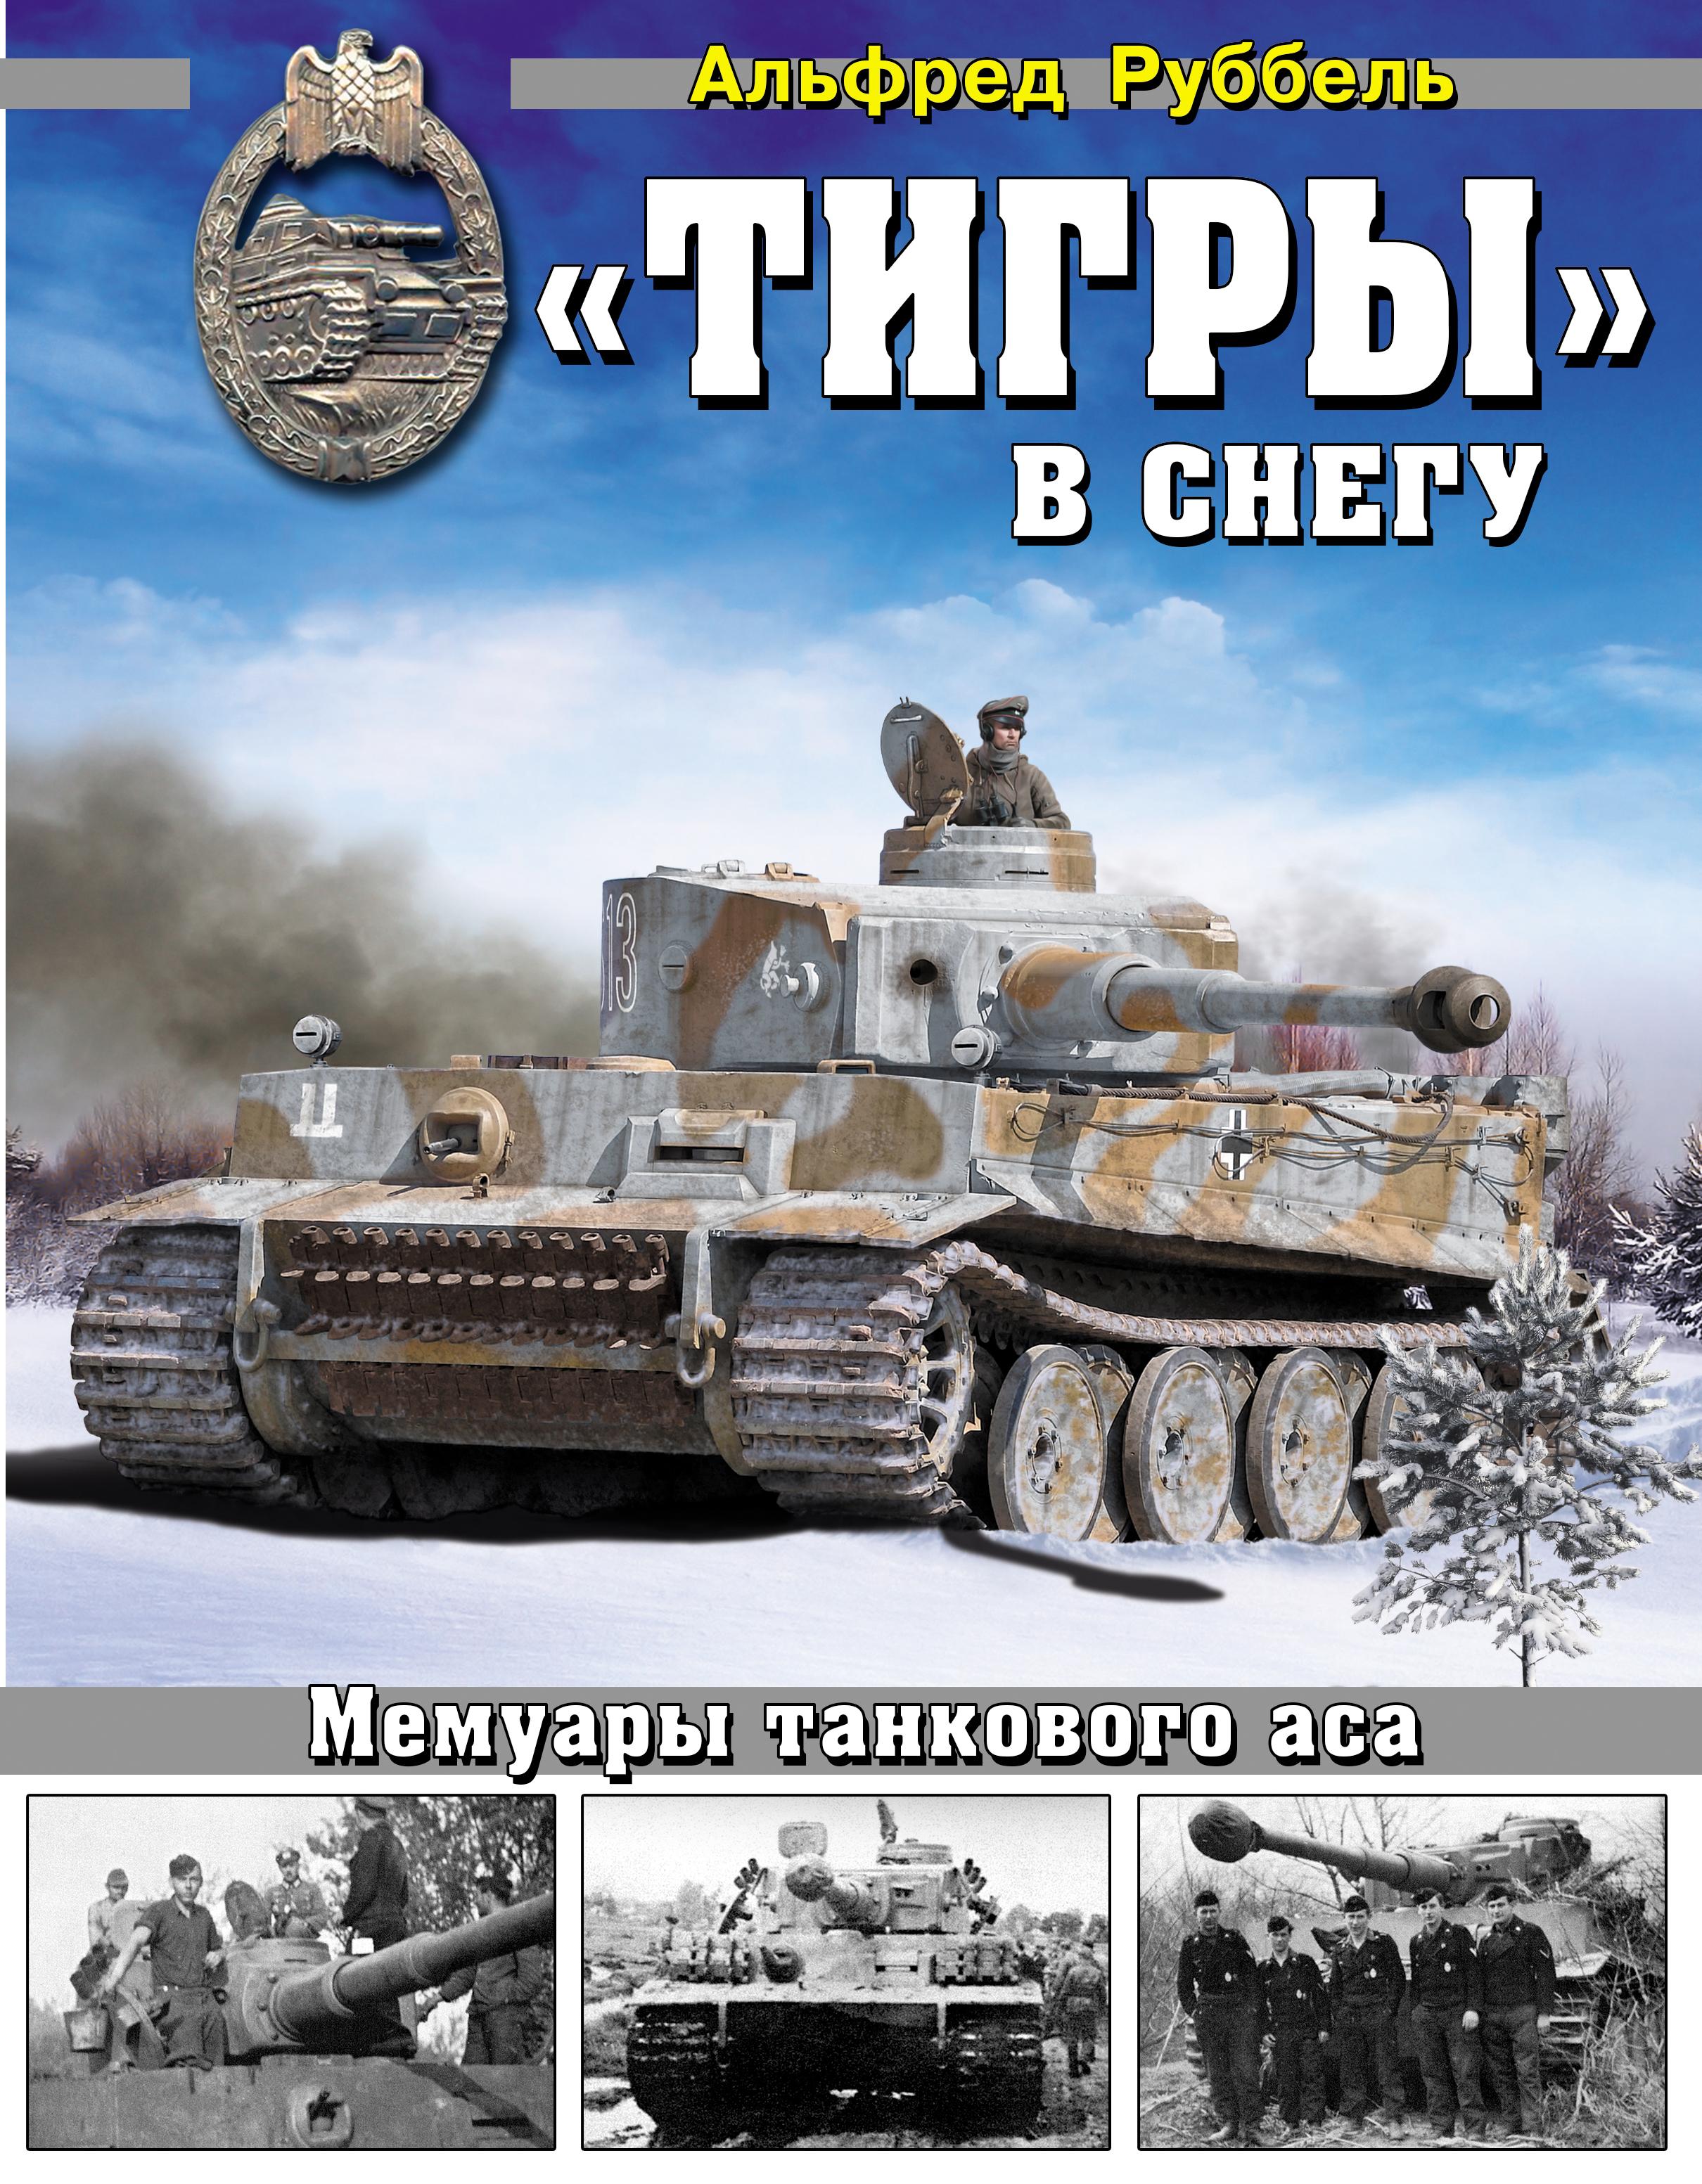 Тигры» в снегу. Мемуары танкового аса